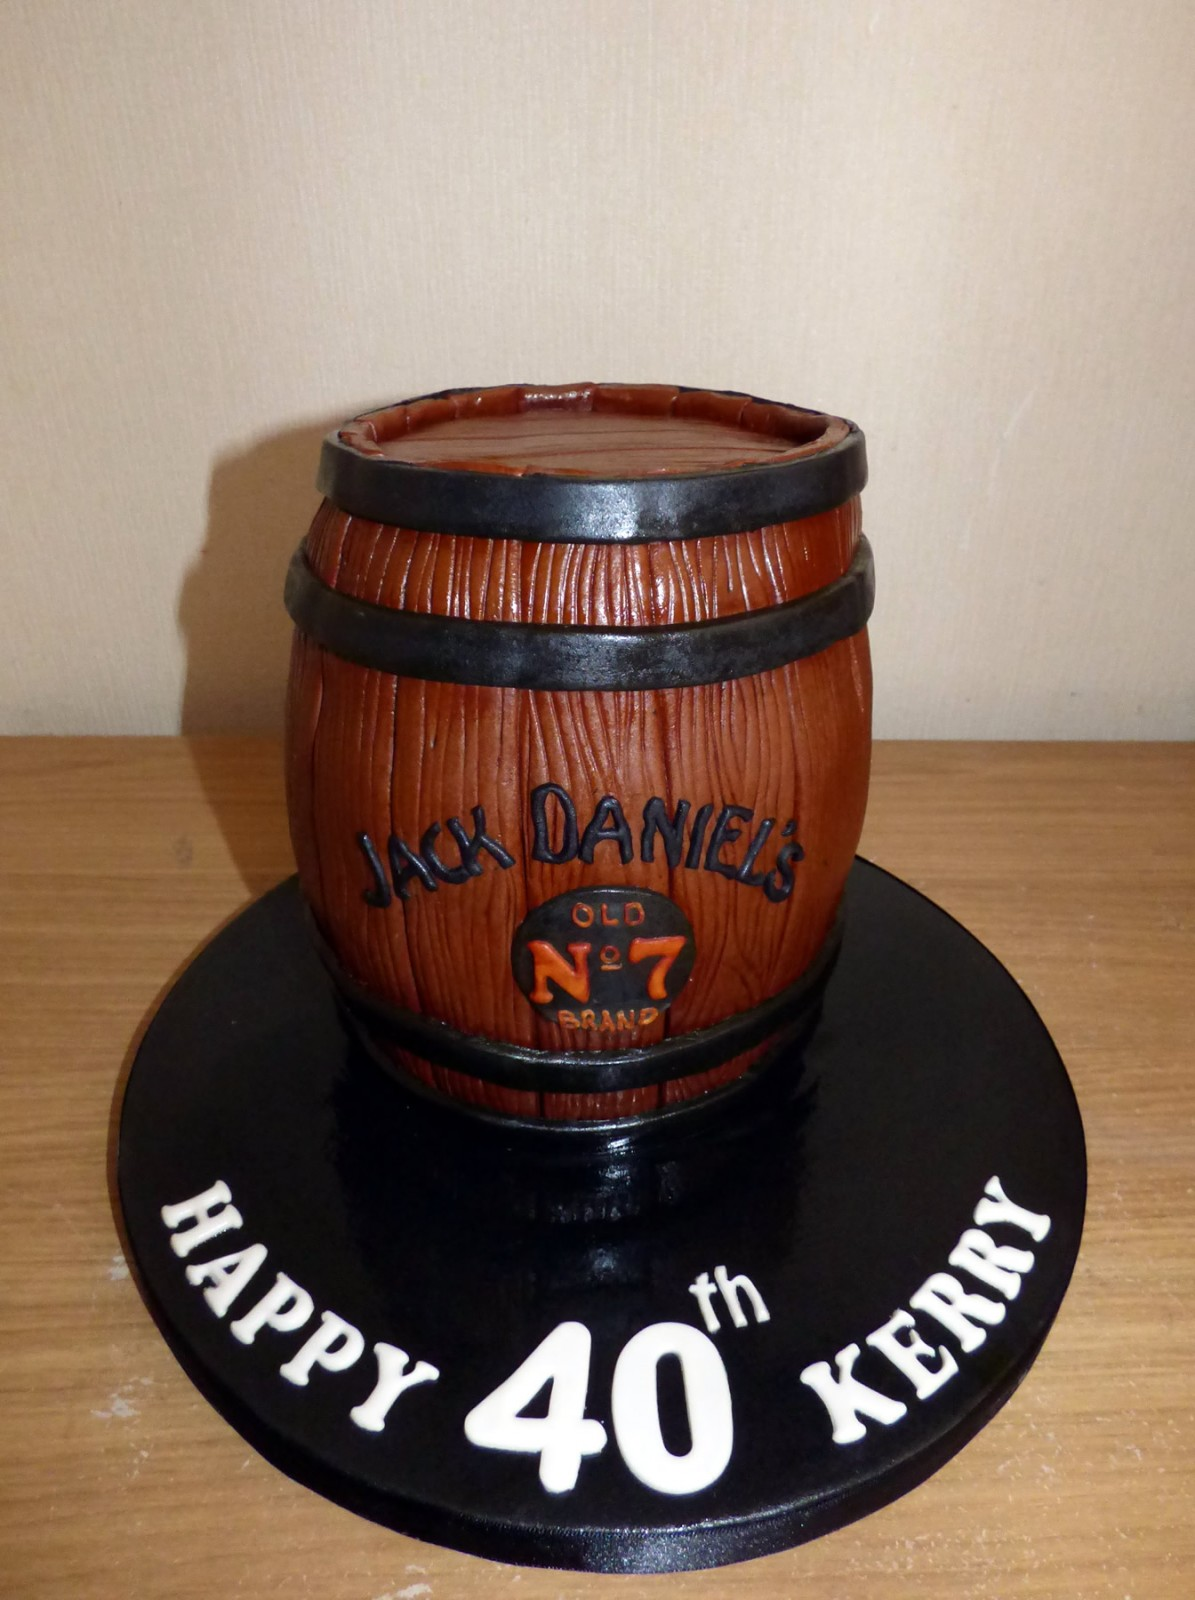 Magnificent Jack Daniels Barrel Birthday Cake Susies Cakes Personalised Birthday Cards Sponlily Jamesorg